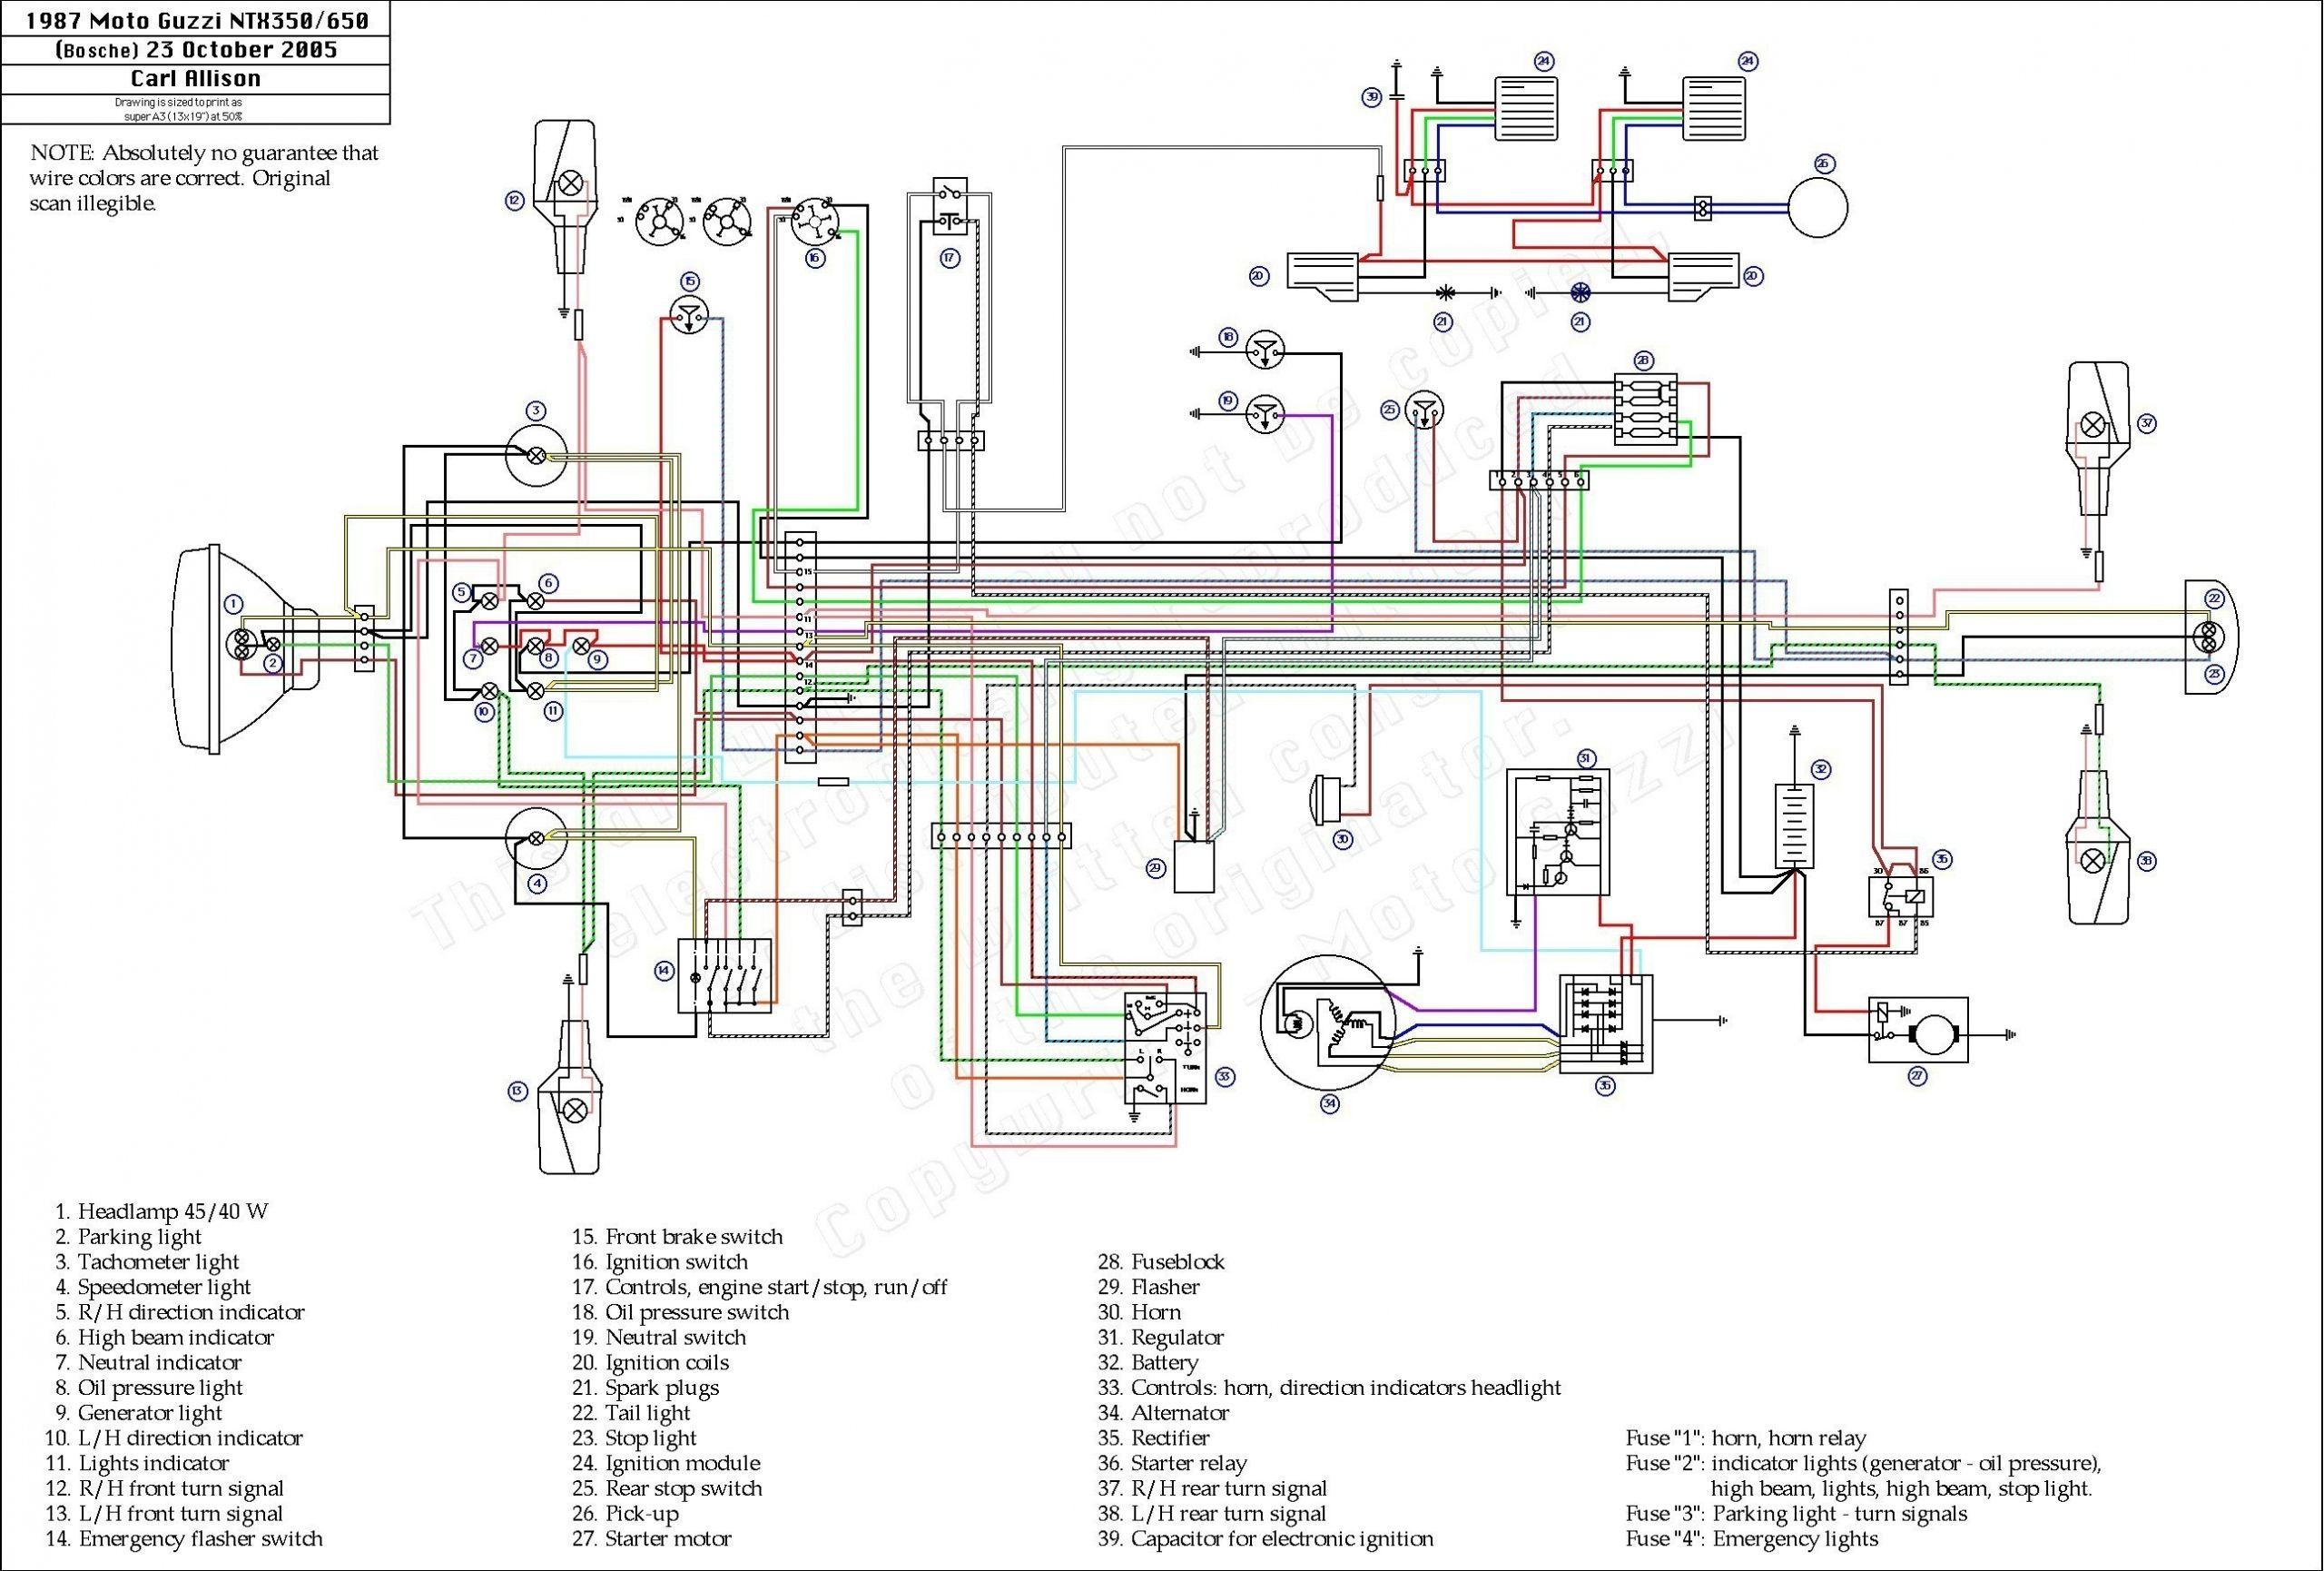 Chinese Atv Wiring Diagram 110 Untpikapps Motorcycle Wiring Electrical Wiring Diagram Electrical Diagram